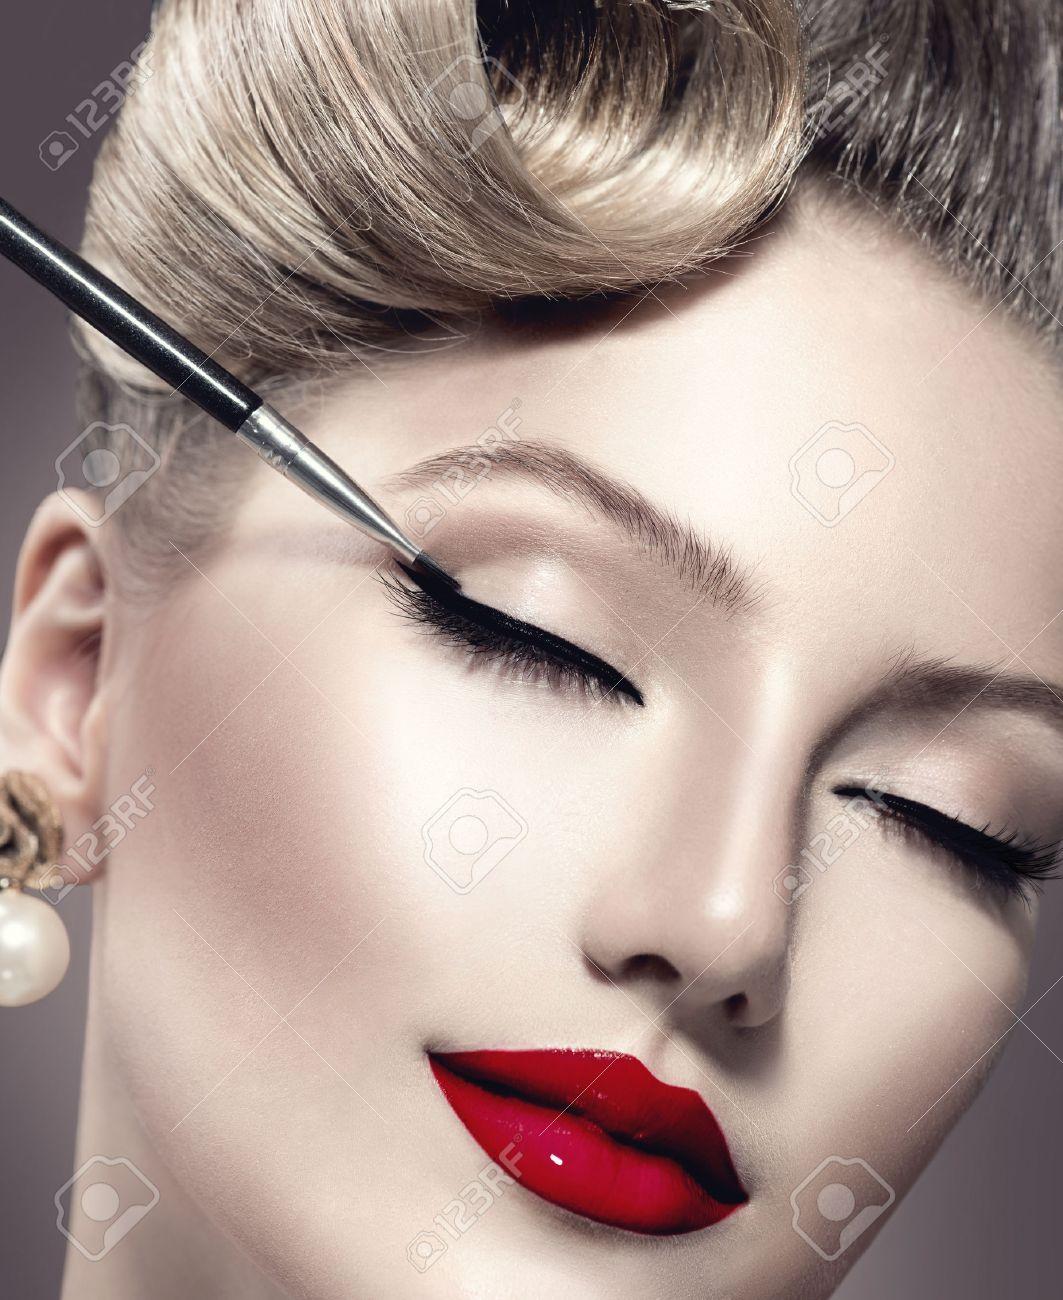 Styles Makeup Makeup Vintage Style Make-up